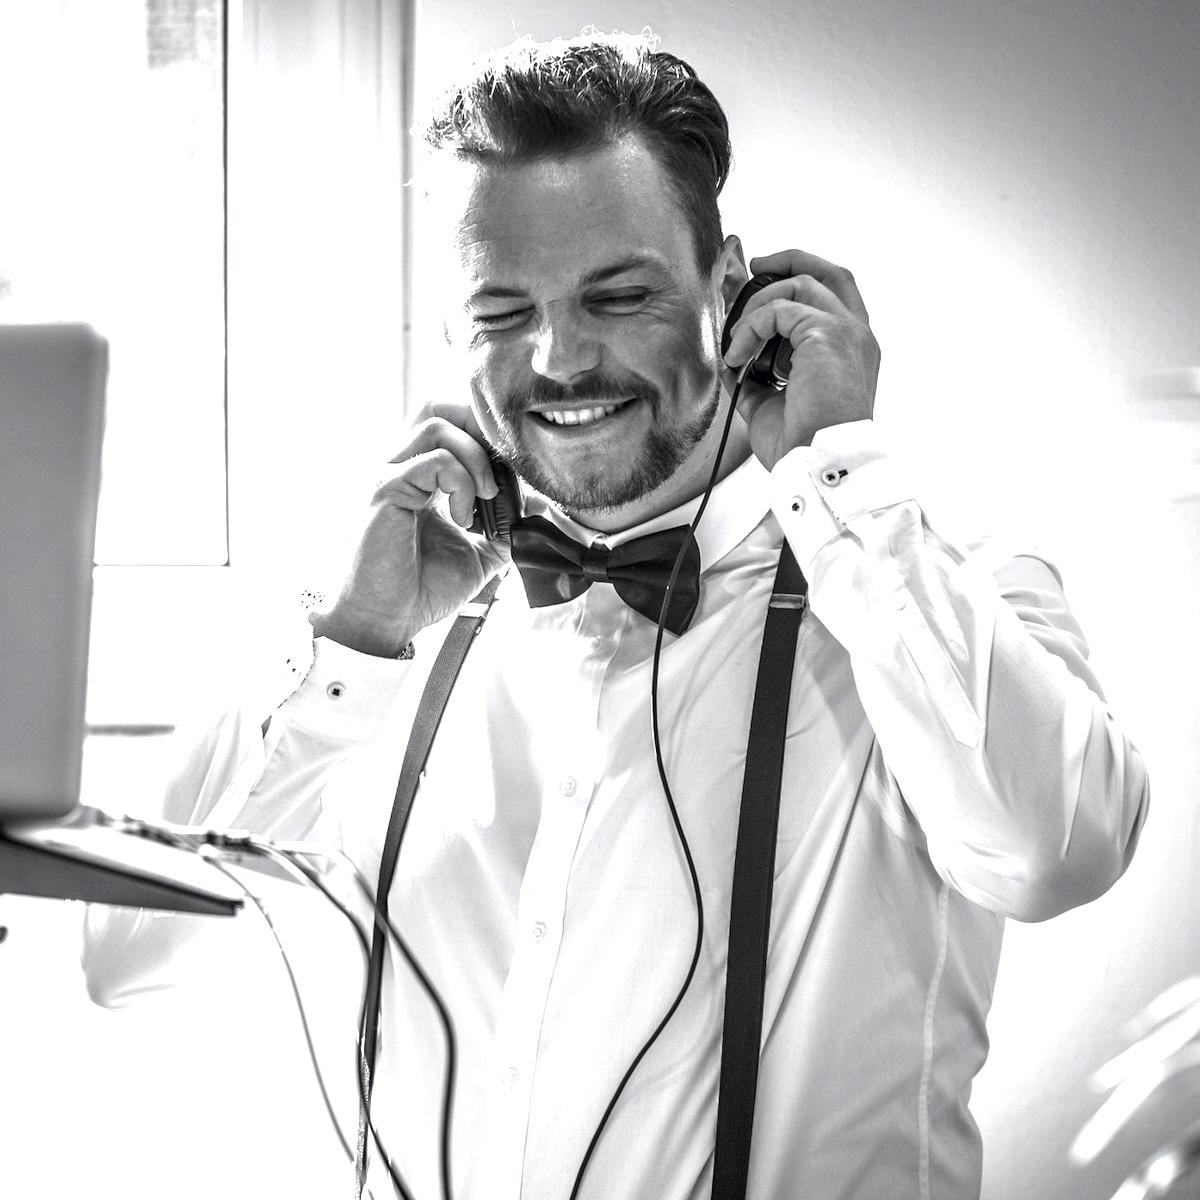 DJ |Hannover |Hochzeit |DJ |Marco |Kern |DJ |Firmenfeier |DJ |Geburtstag |DJ |Messeparty |DJ |Betriebsfeier |DJ |Sommerfest |DJ |Gala |Buchen |Mieten |Anfragen |Lehmann |Eventservice